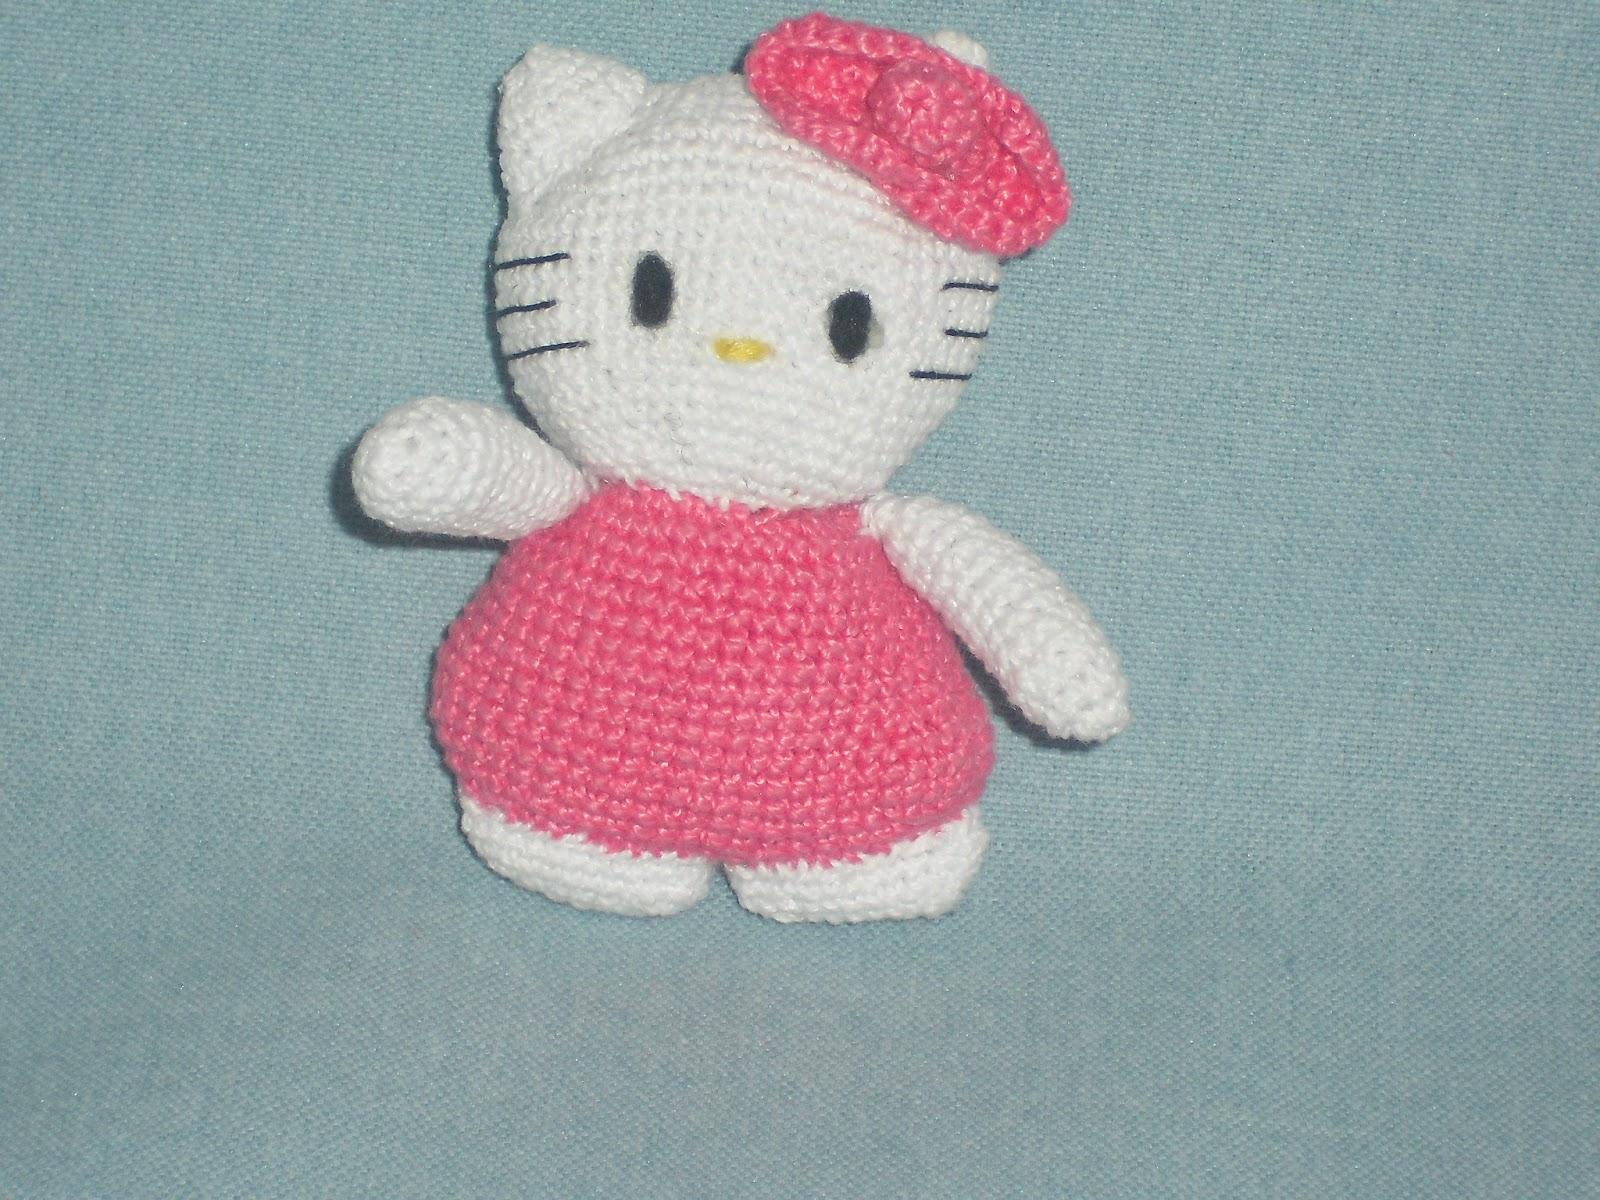 Free Crochet Pattern Heart Shaped Baby Doll : Amigurumis en espanol: Mi Hello Kitty amigurumi.